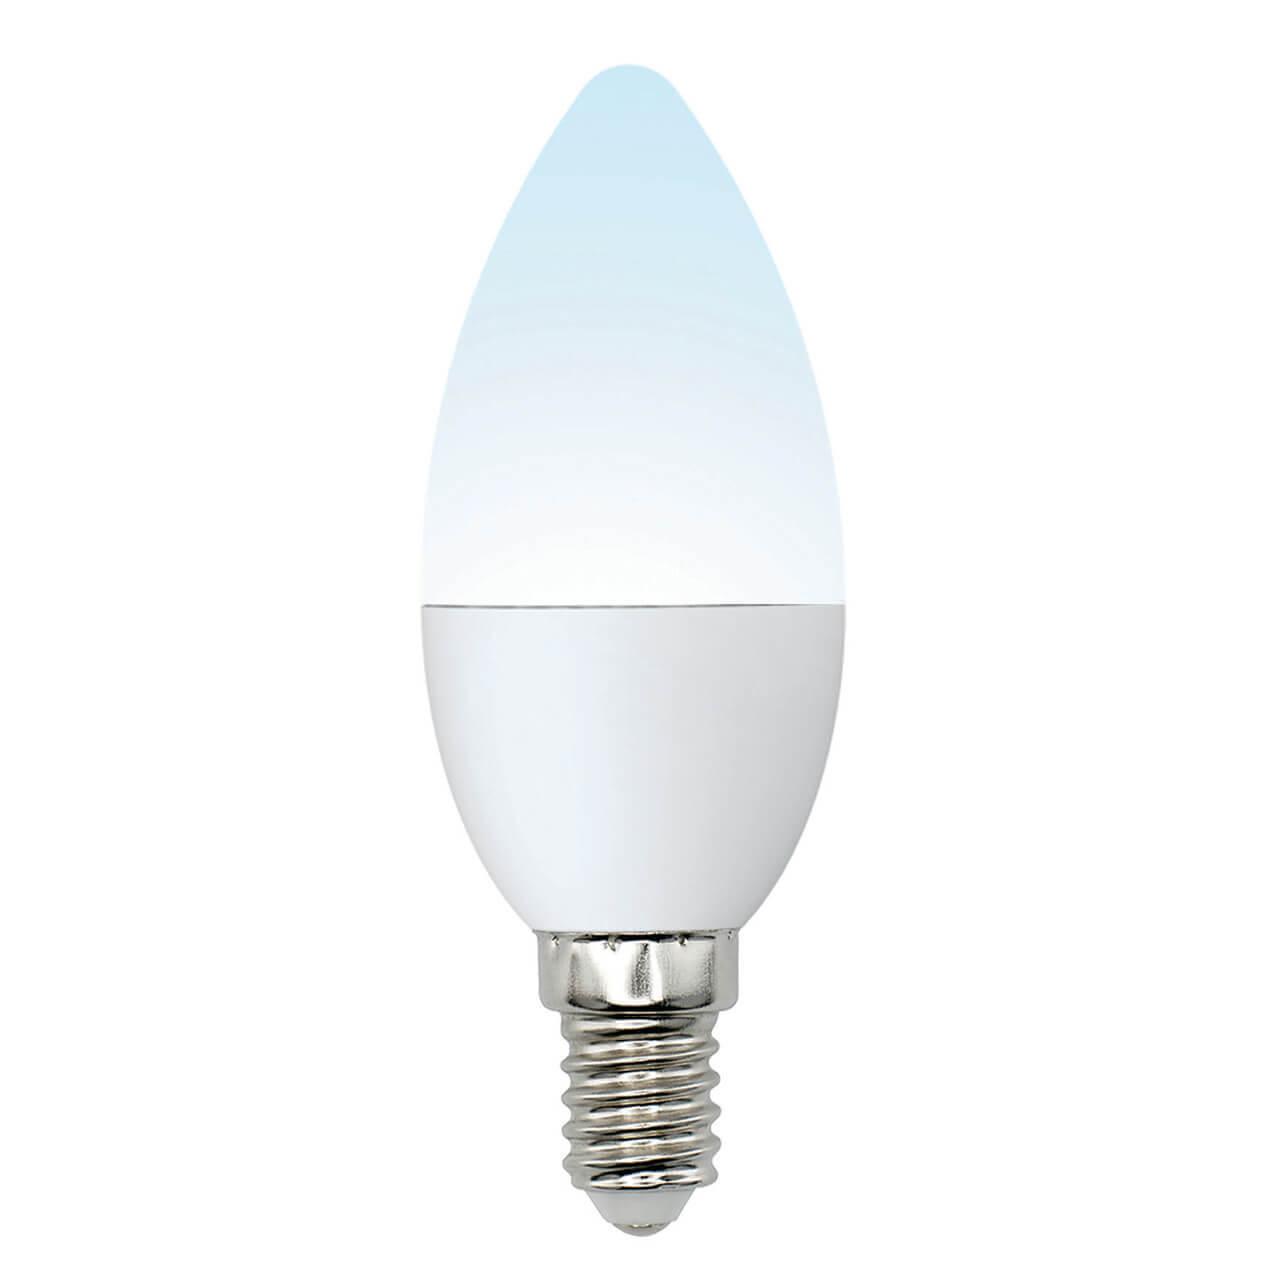 цена на Лампочка Uniel LED-C37-6W/NW/E14/FR/MB PLM11WH Multibright